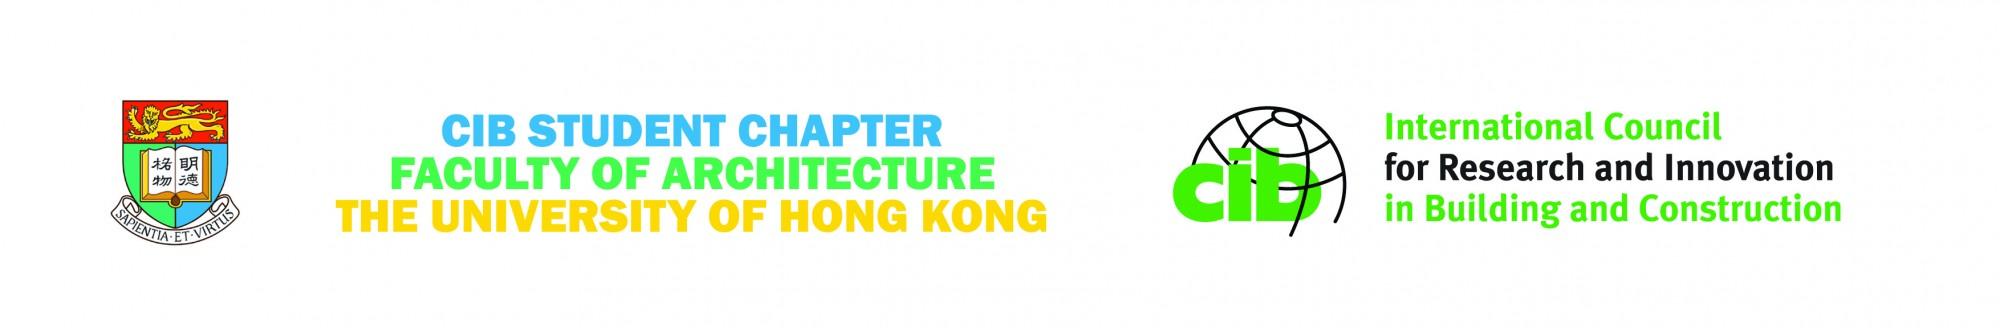 CIB-HKU Student Chapter